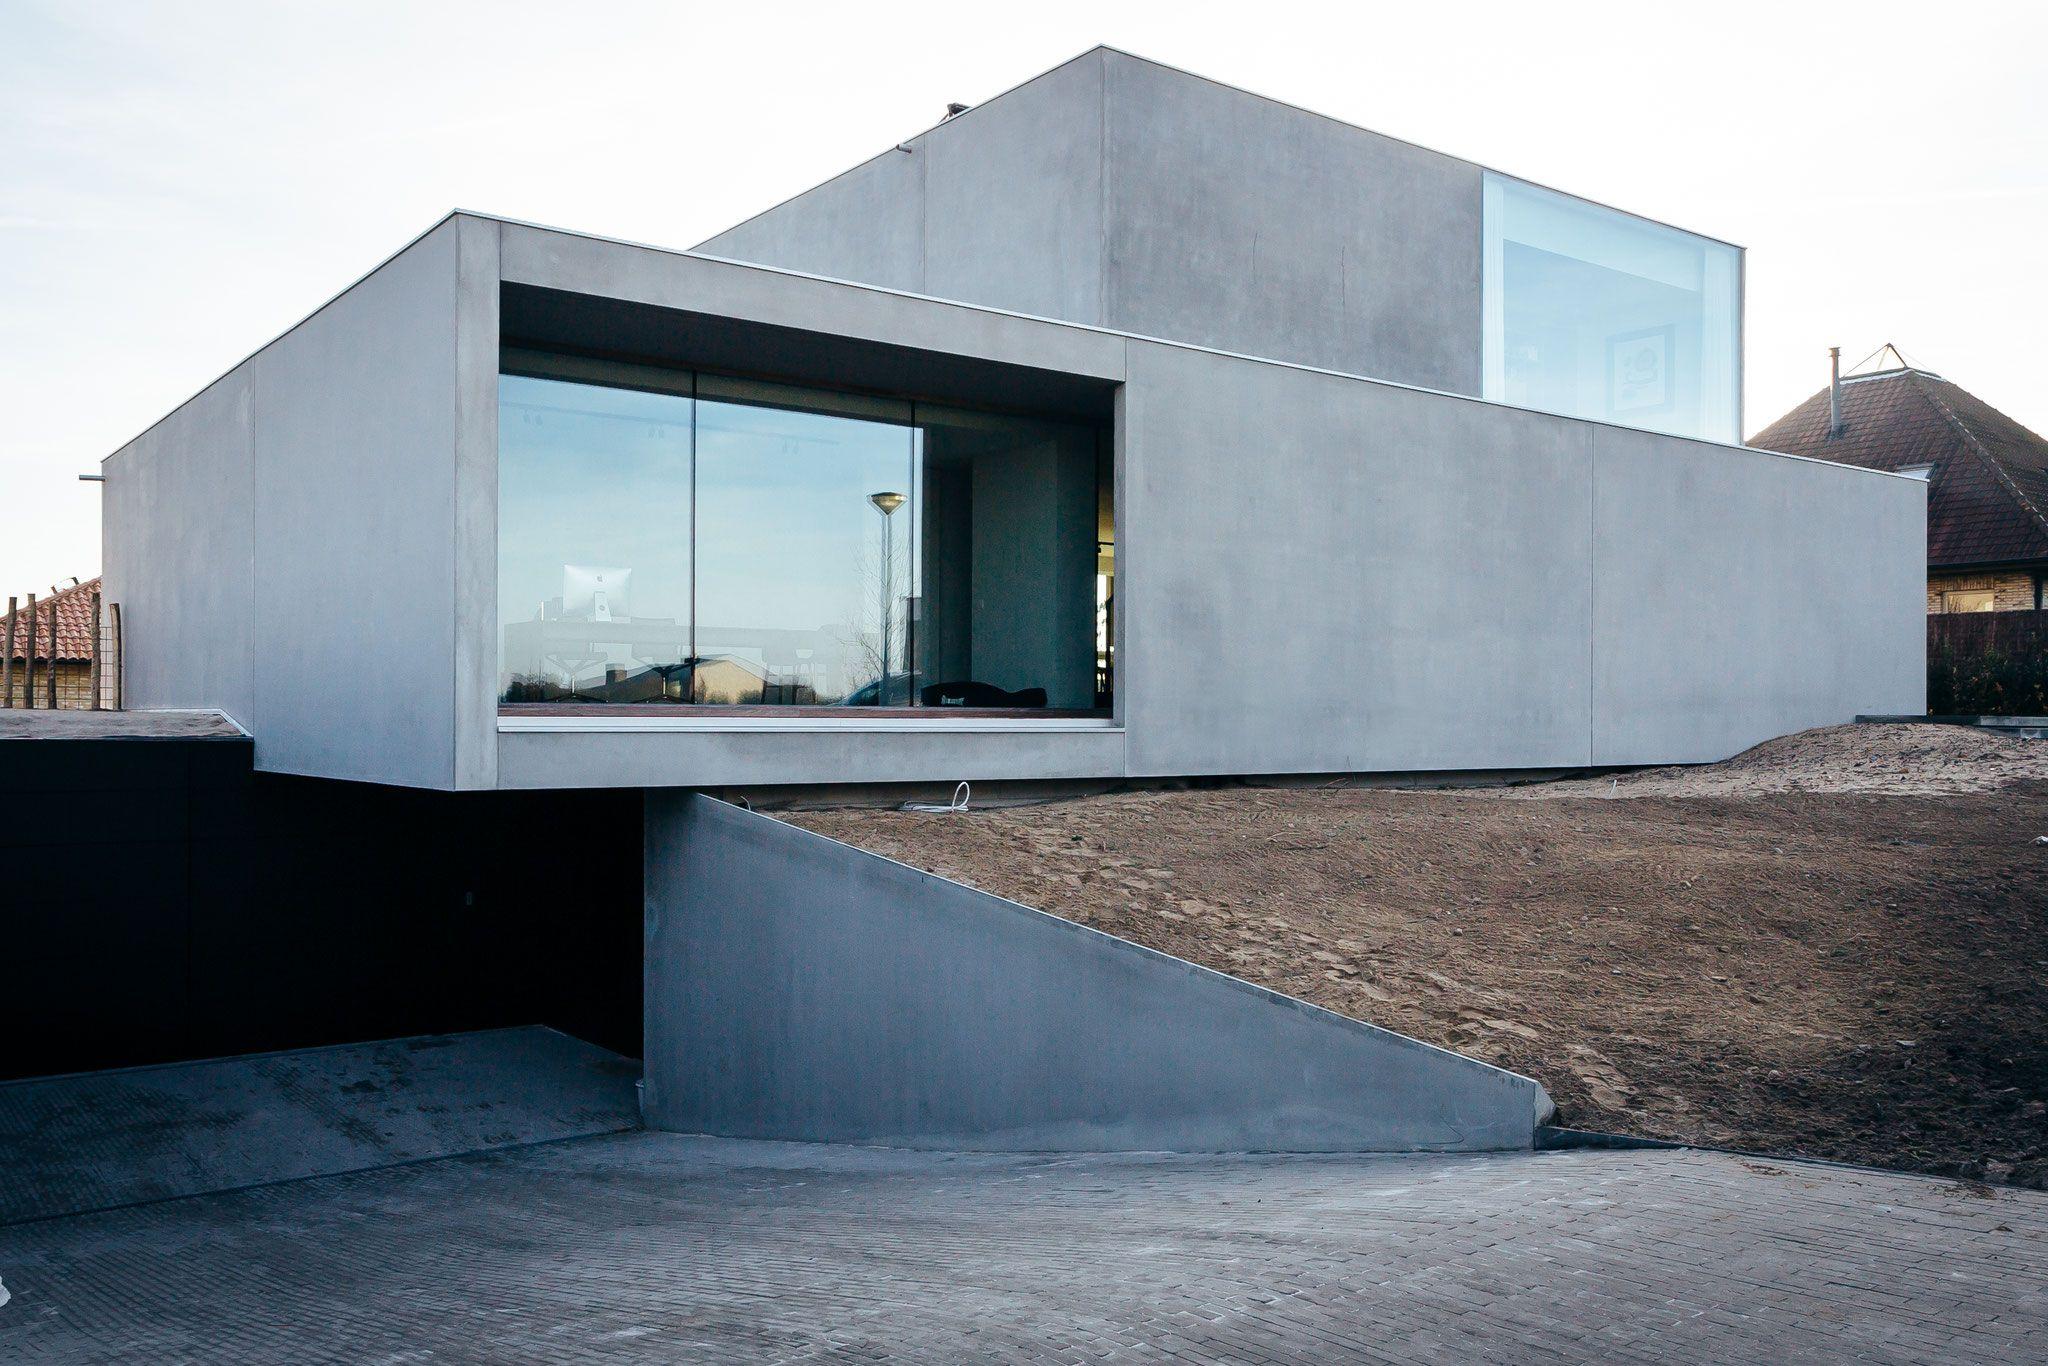 Snel huizen bouw modulair bouwen prefab beton huizen for Maison prefab